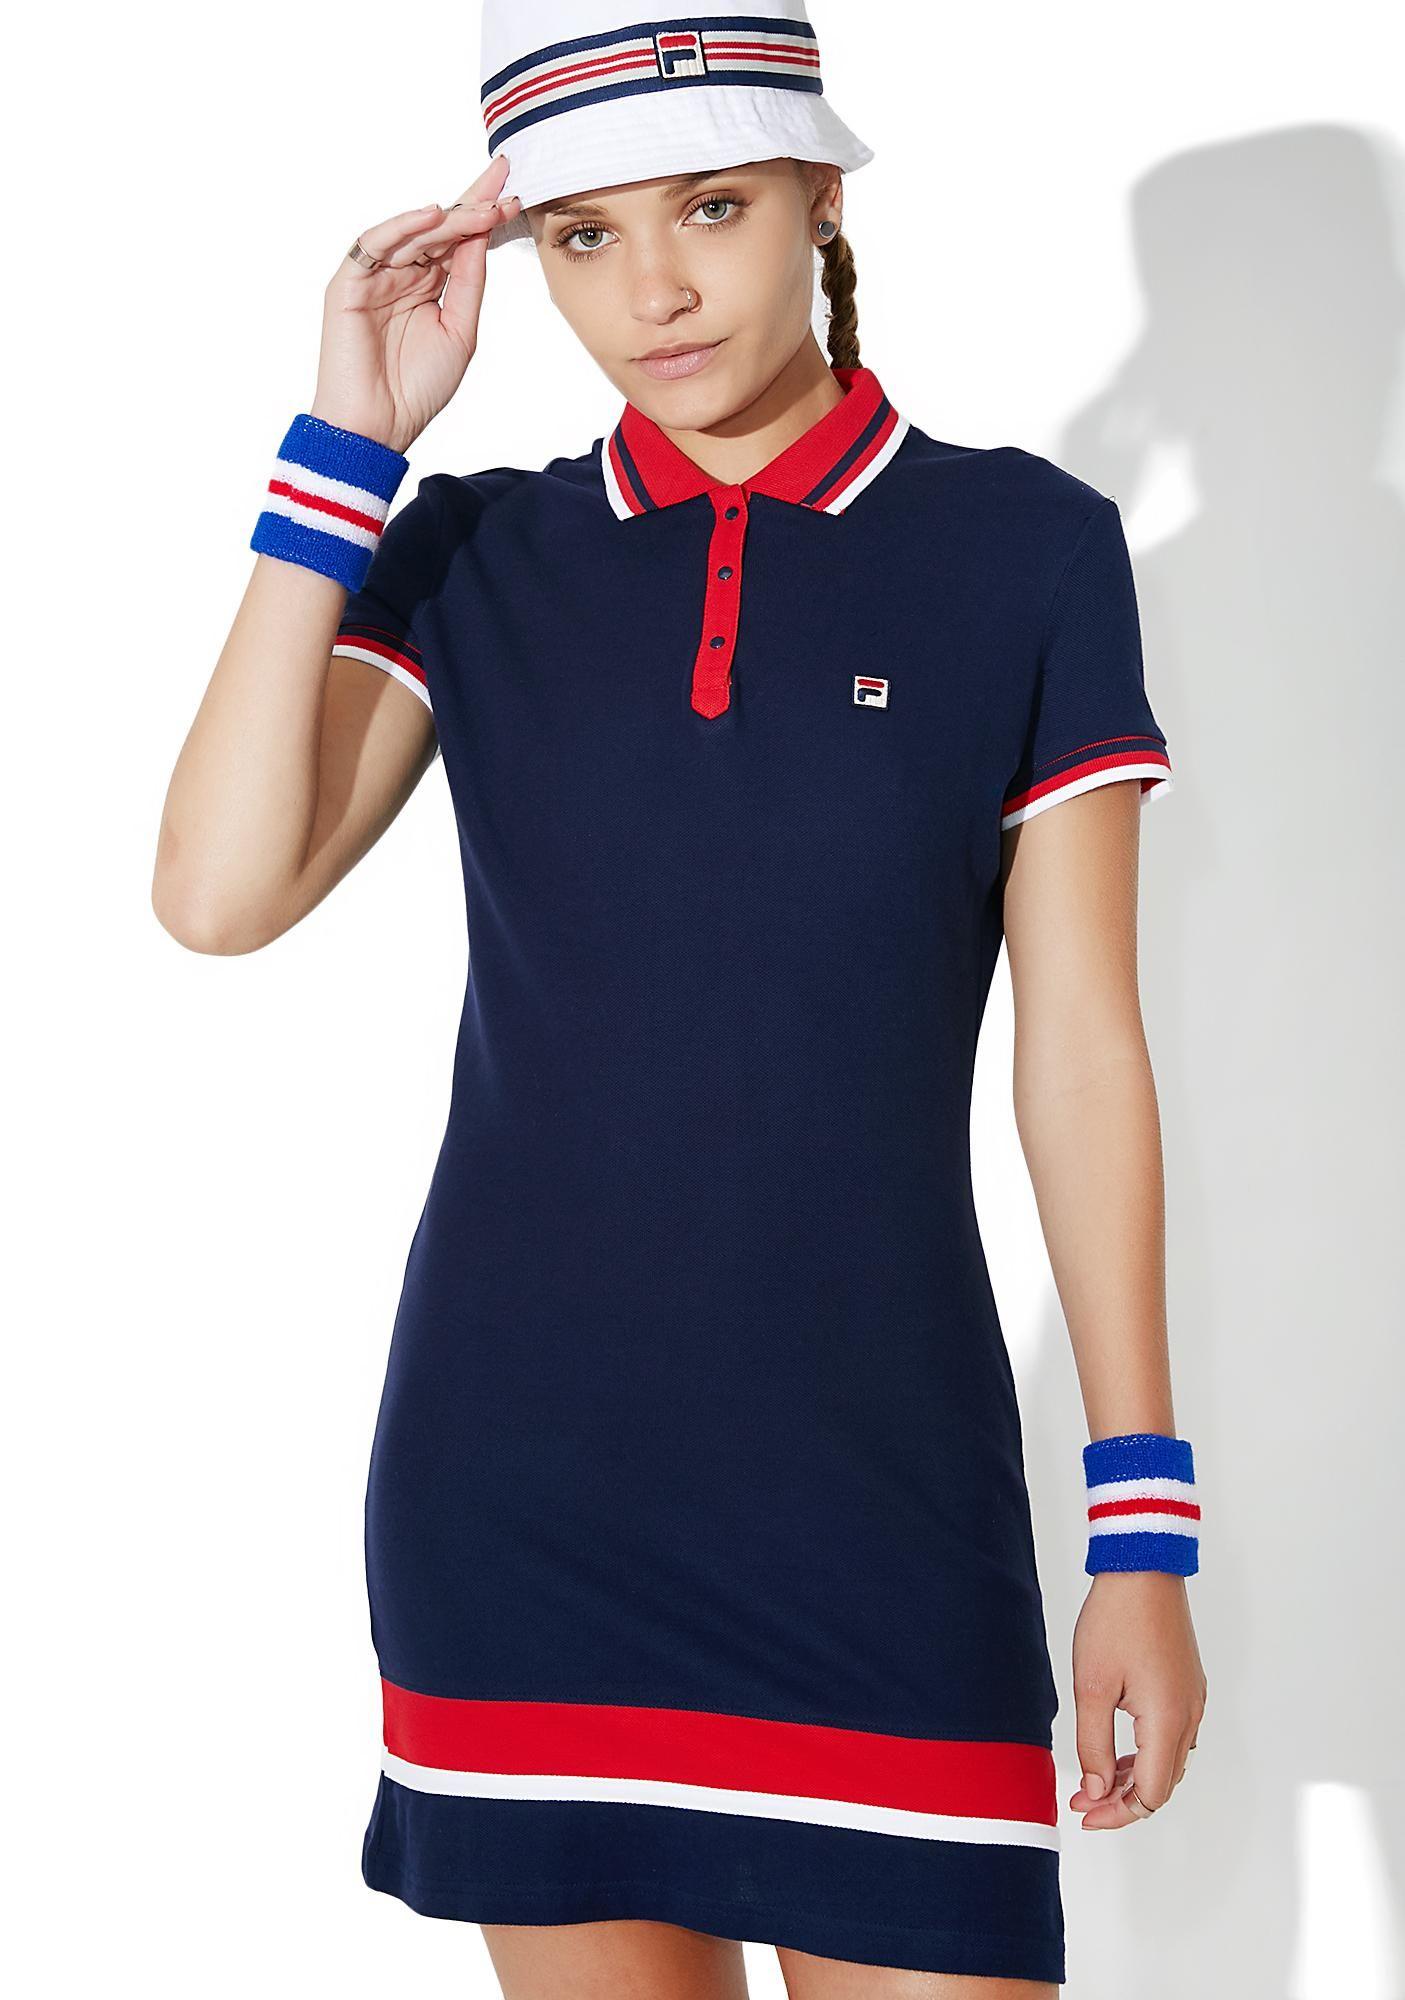 1797f5caa795 Fila Jennifer Dress will have yew feelin' like the next tennis queen, babe.